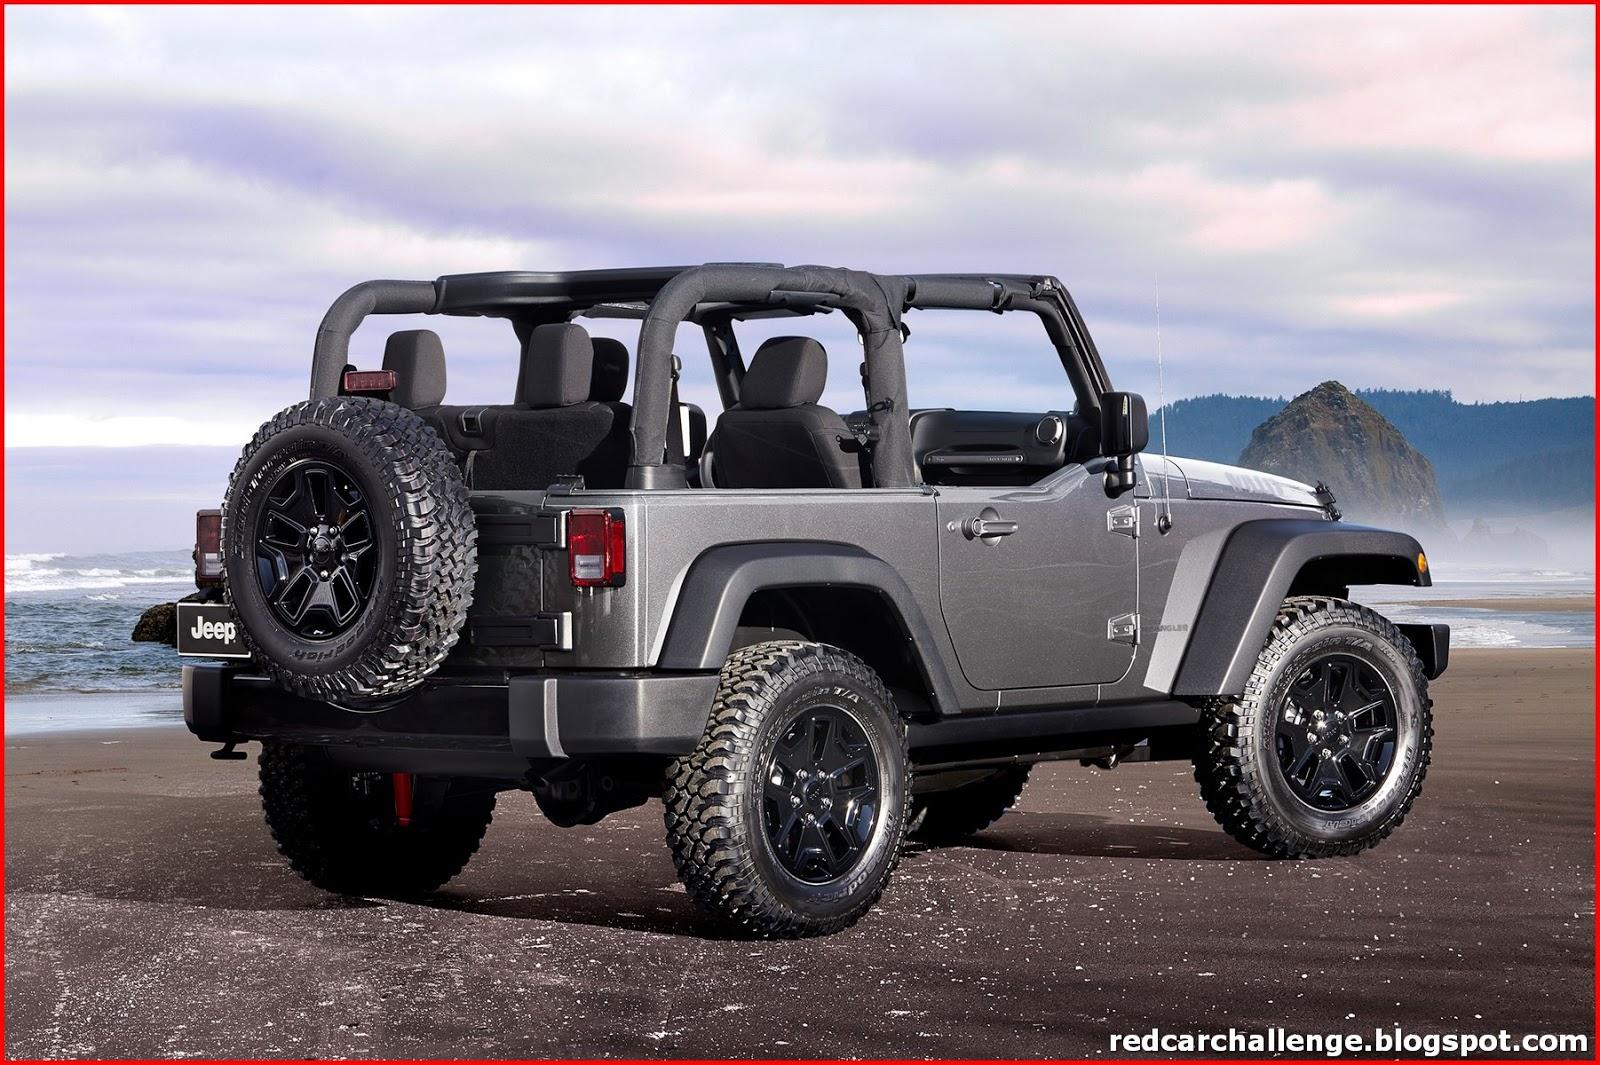 2015 Jeep Wrangler MSRP